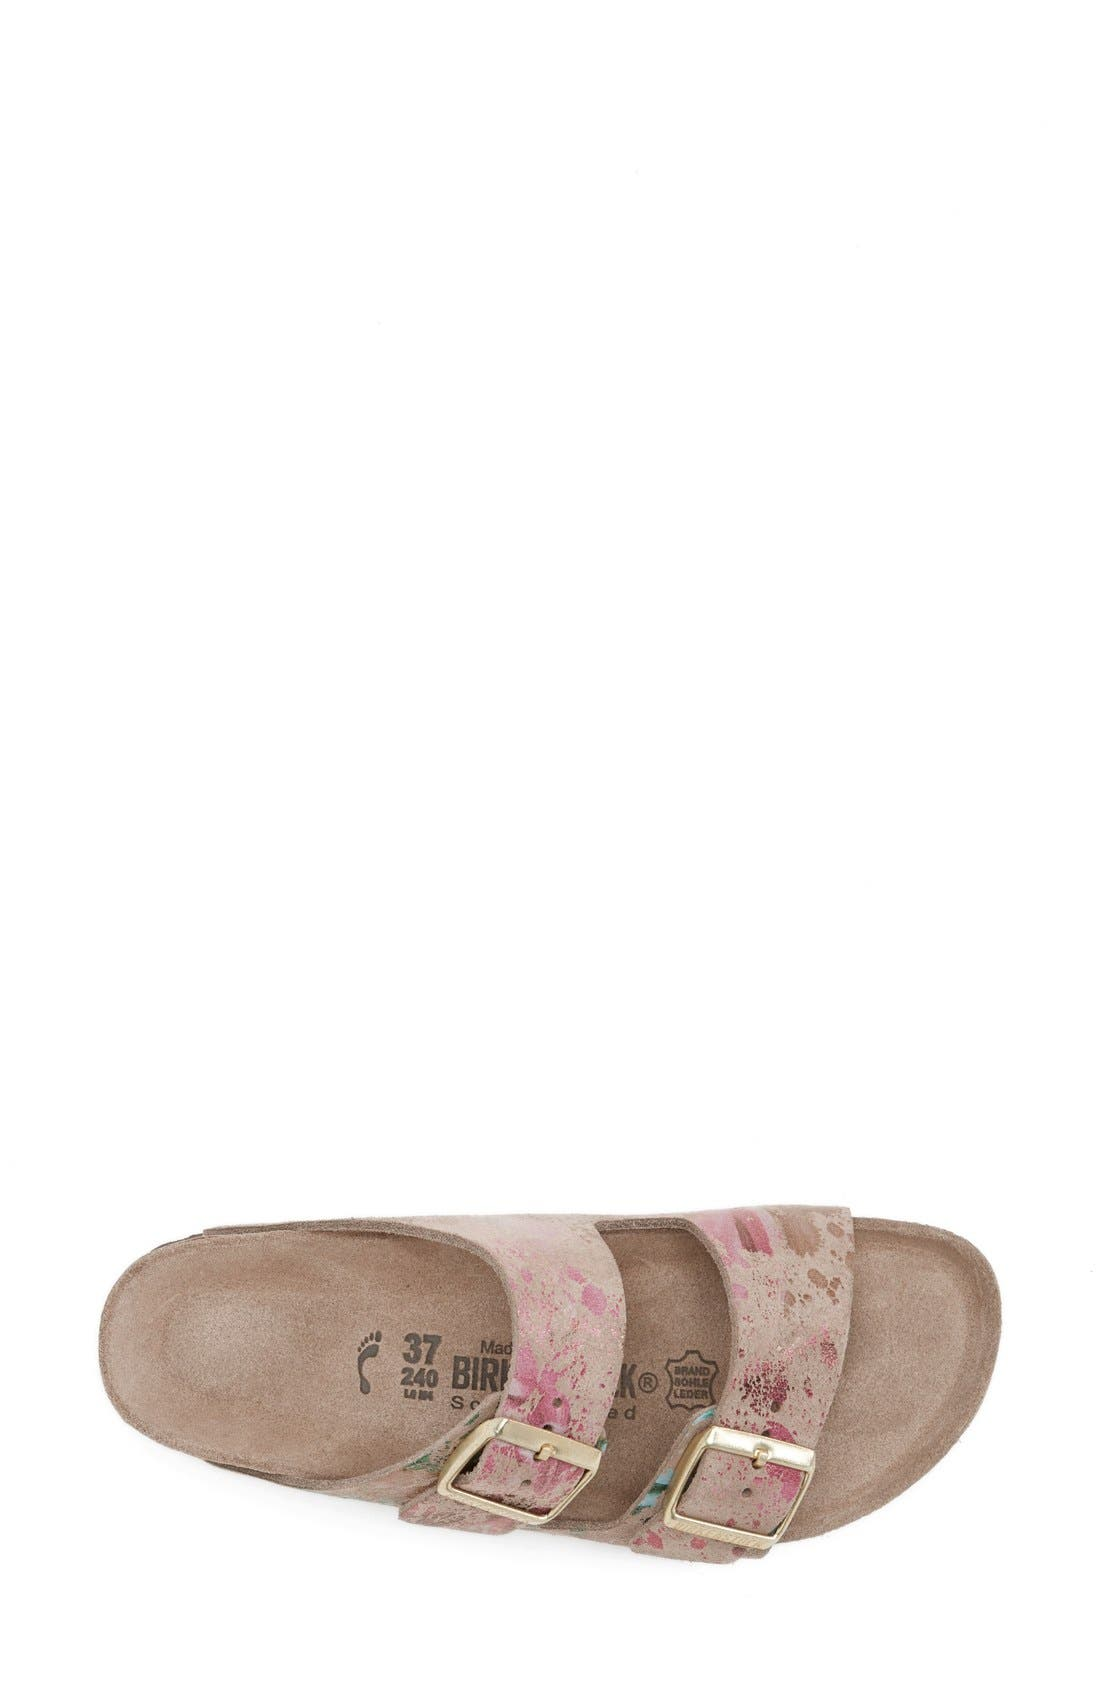 Alternate Image 3  - Birkenstock 'Arizona' Soft Footbed Printed Leather Sandal (Women)